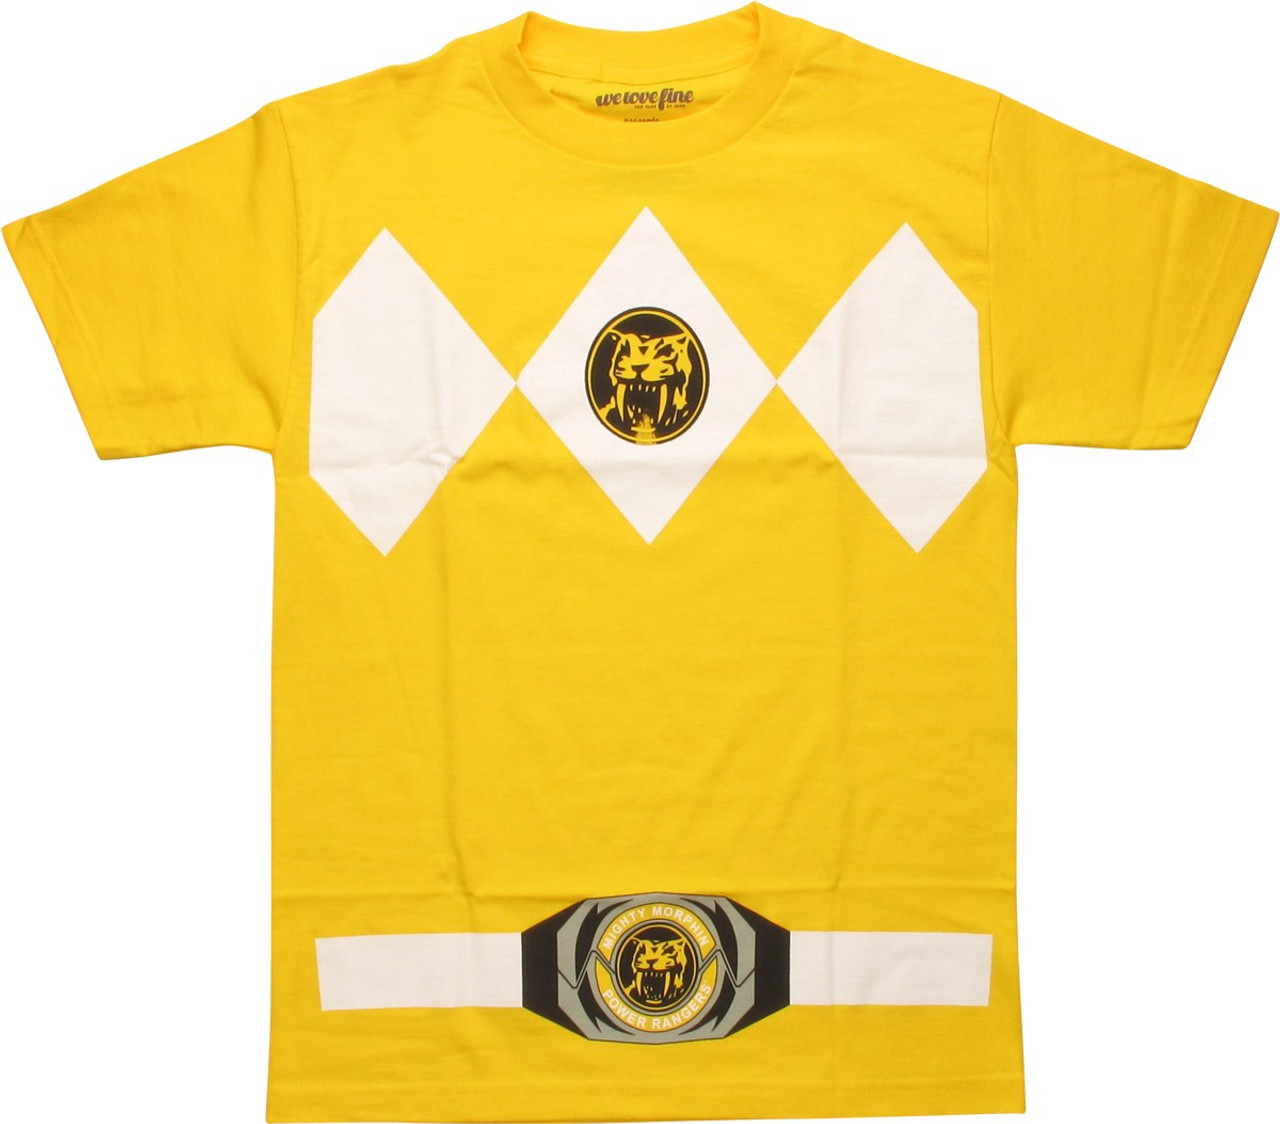 Dark Gray Grunge Cyber Punk Goth Crop Top Sweatshirt 281 mv Shirt 1XL 2XL 3XL